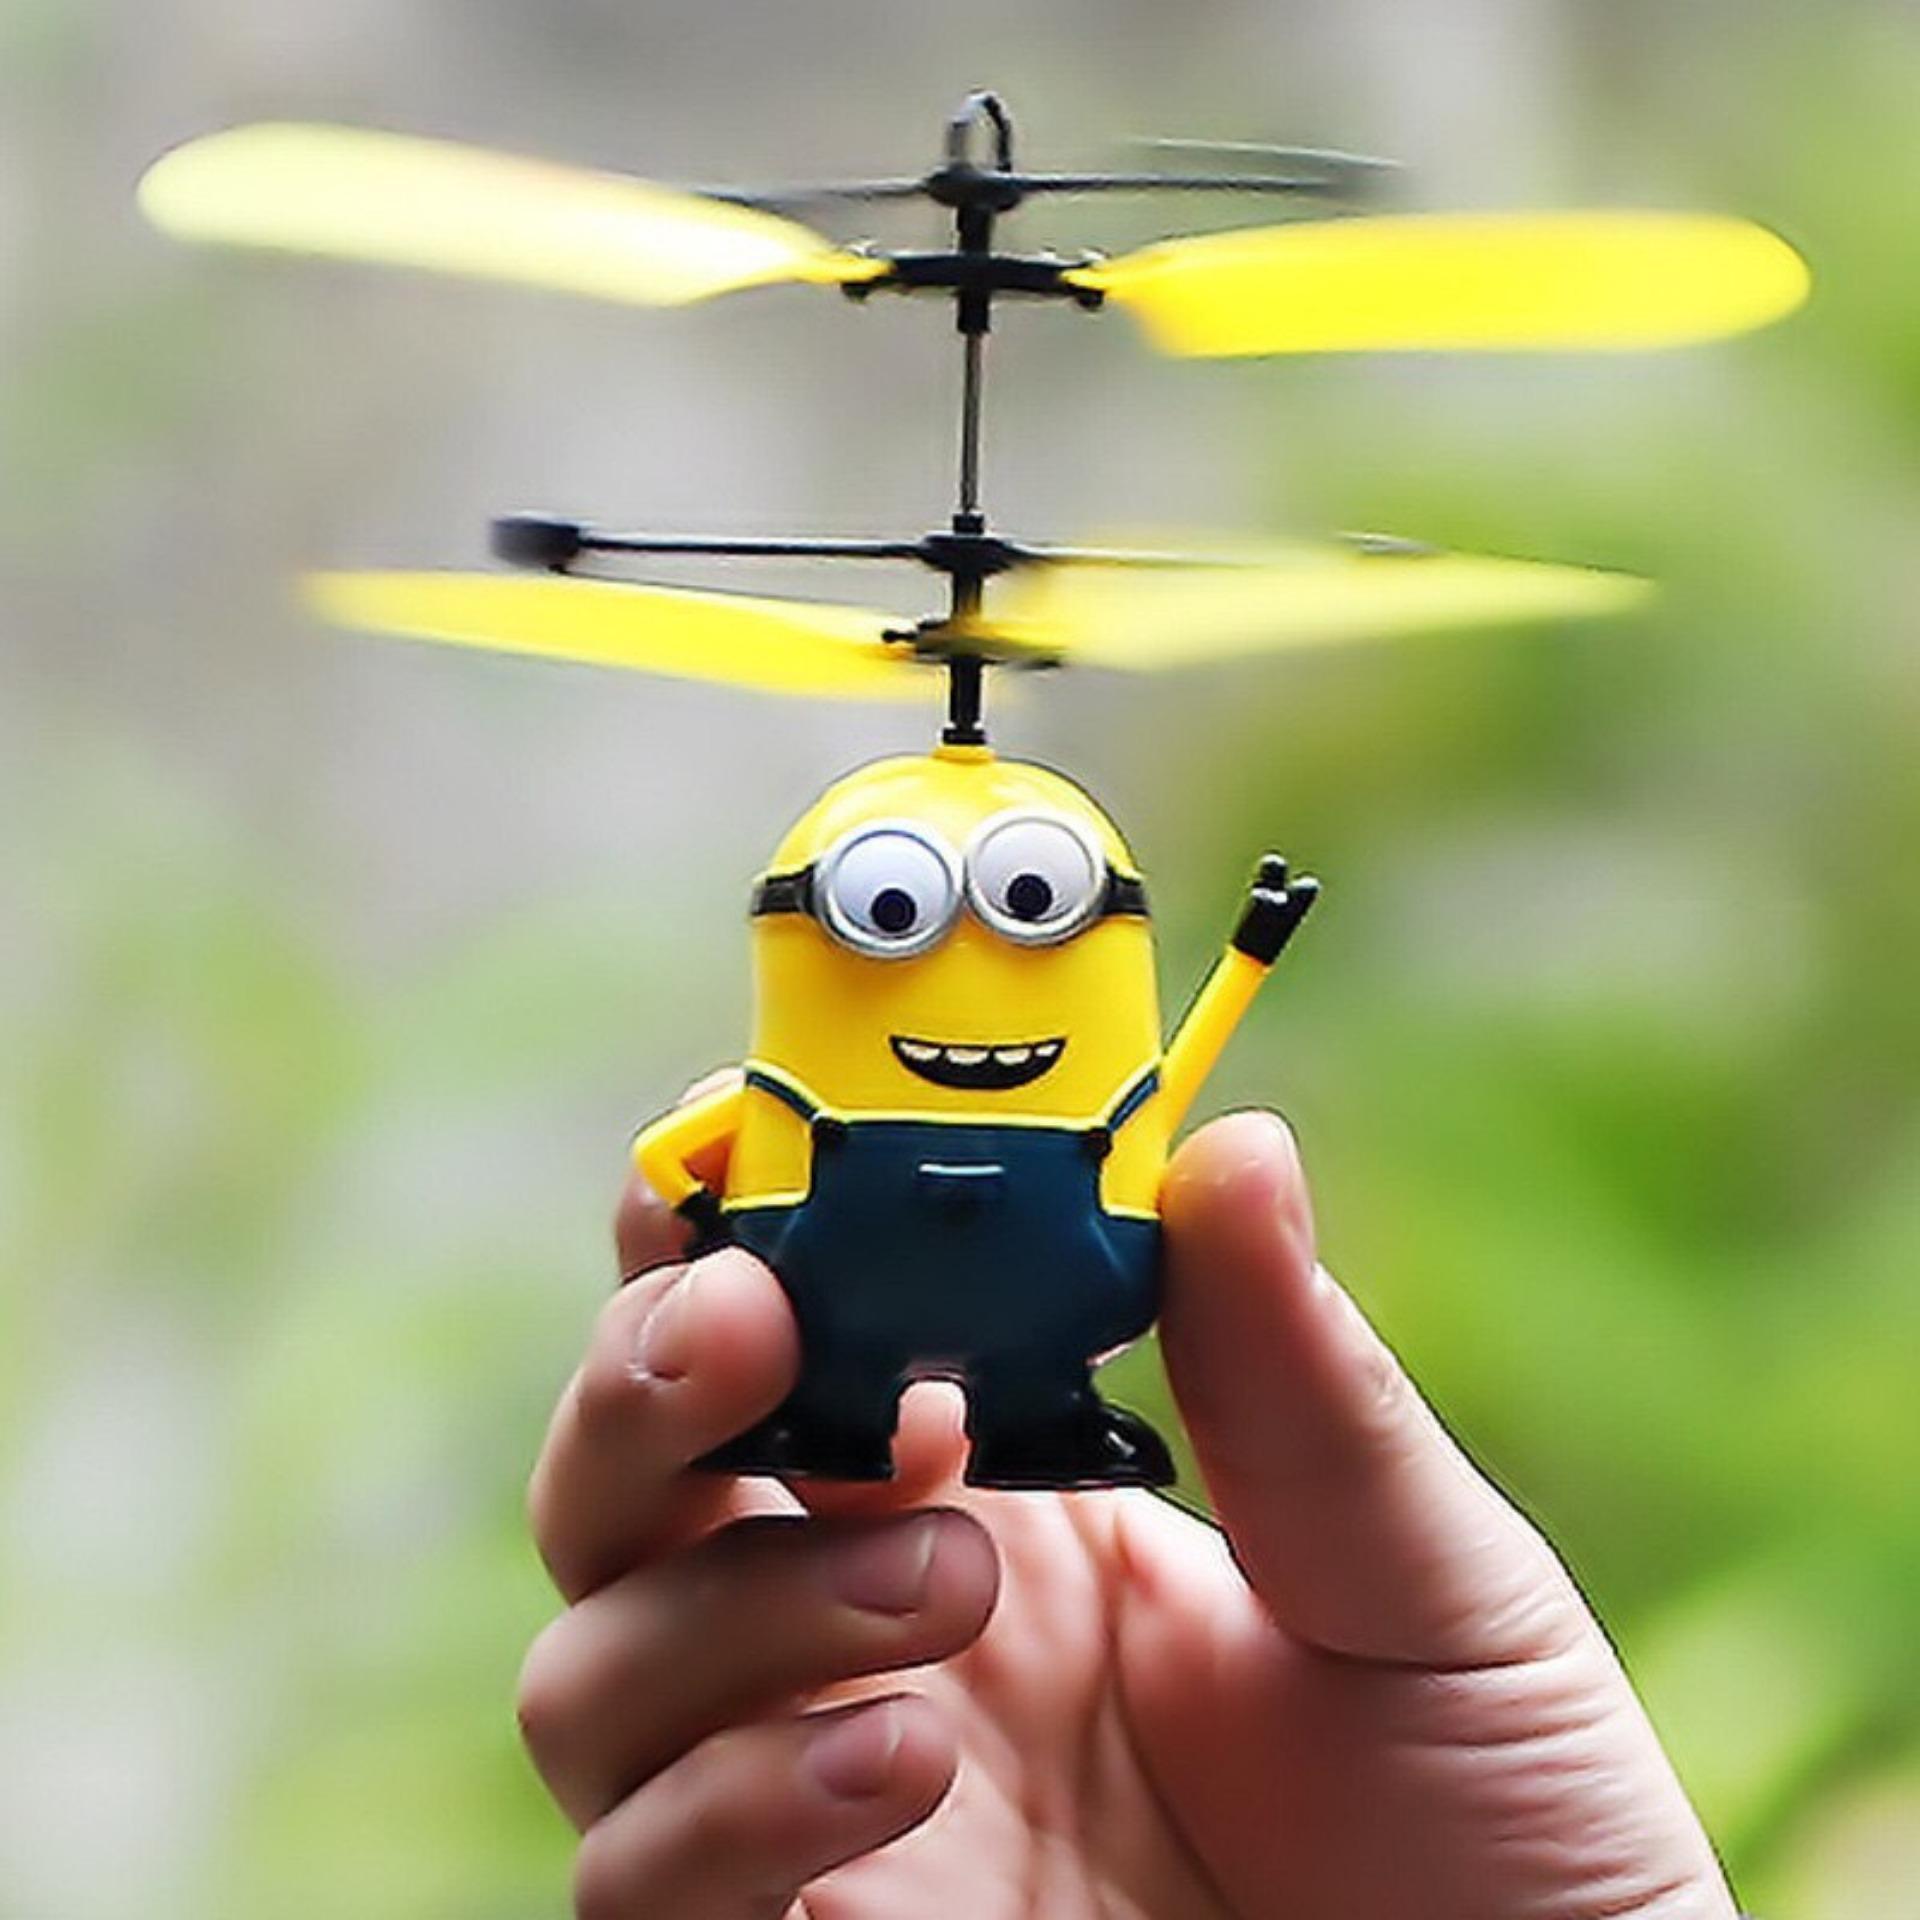 ... FLYING TOYS MINION KARAKTER MAINAN ANAK HELIKOPTER ...